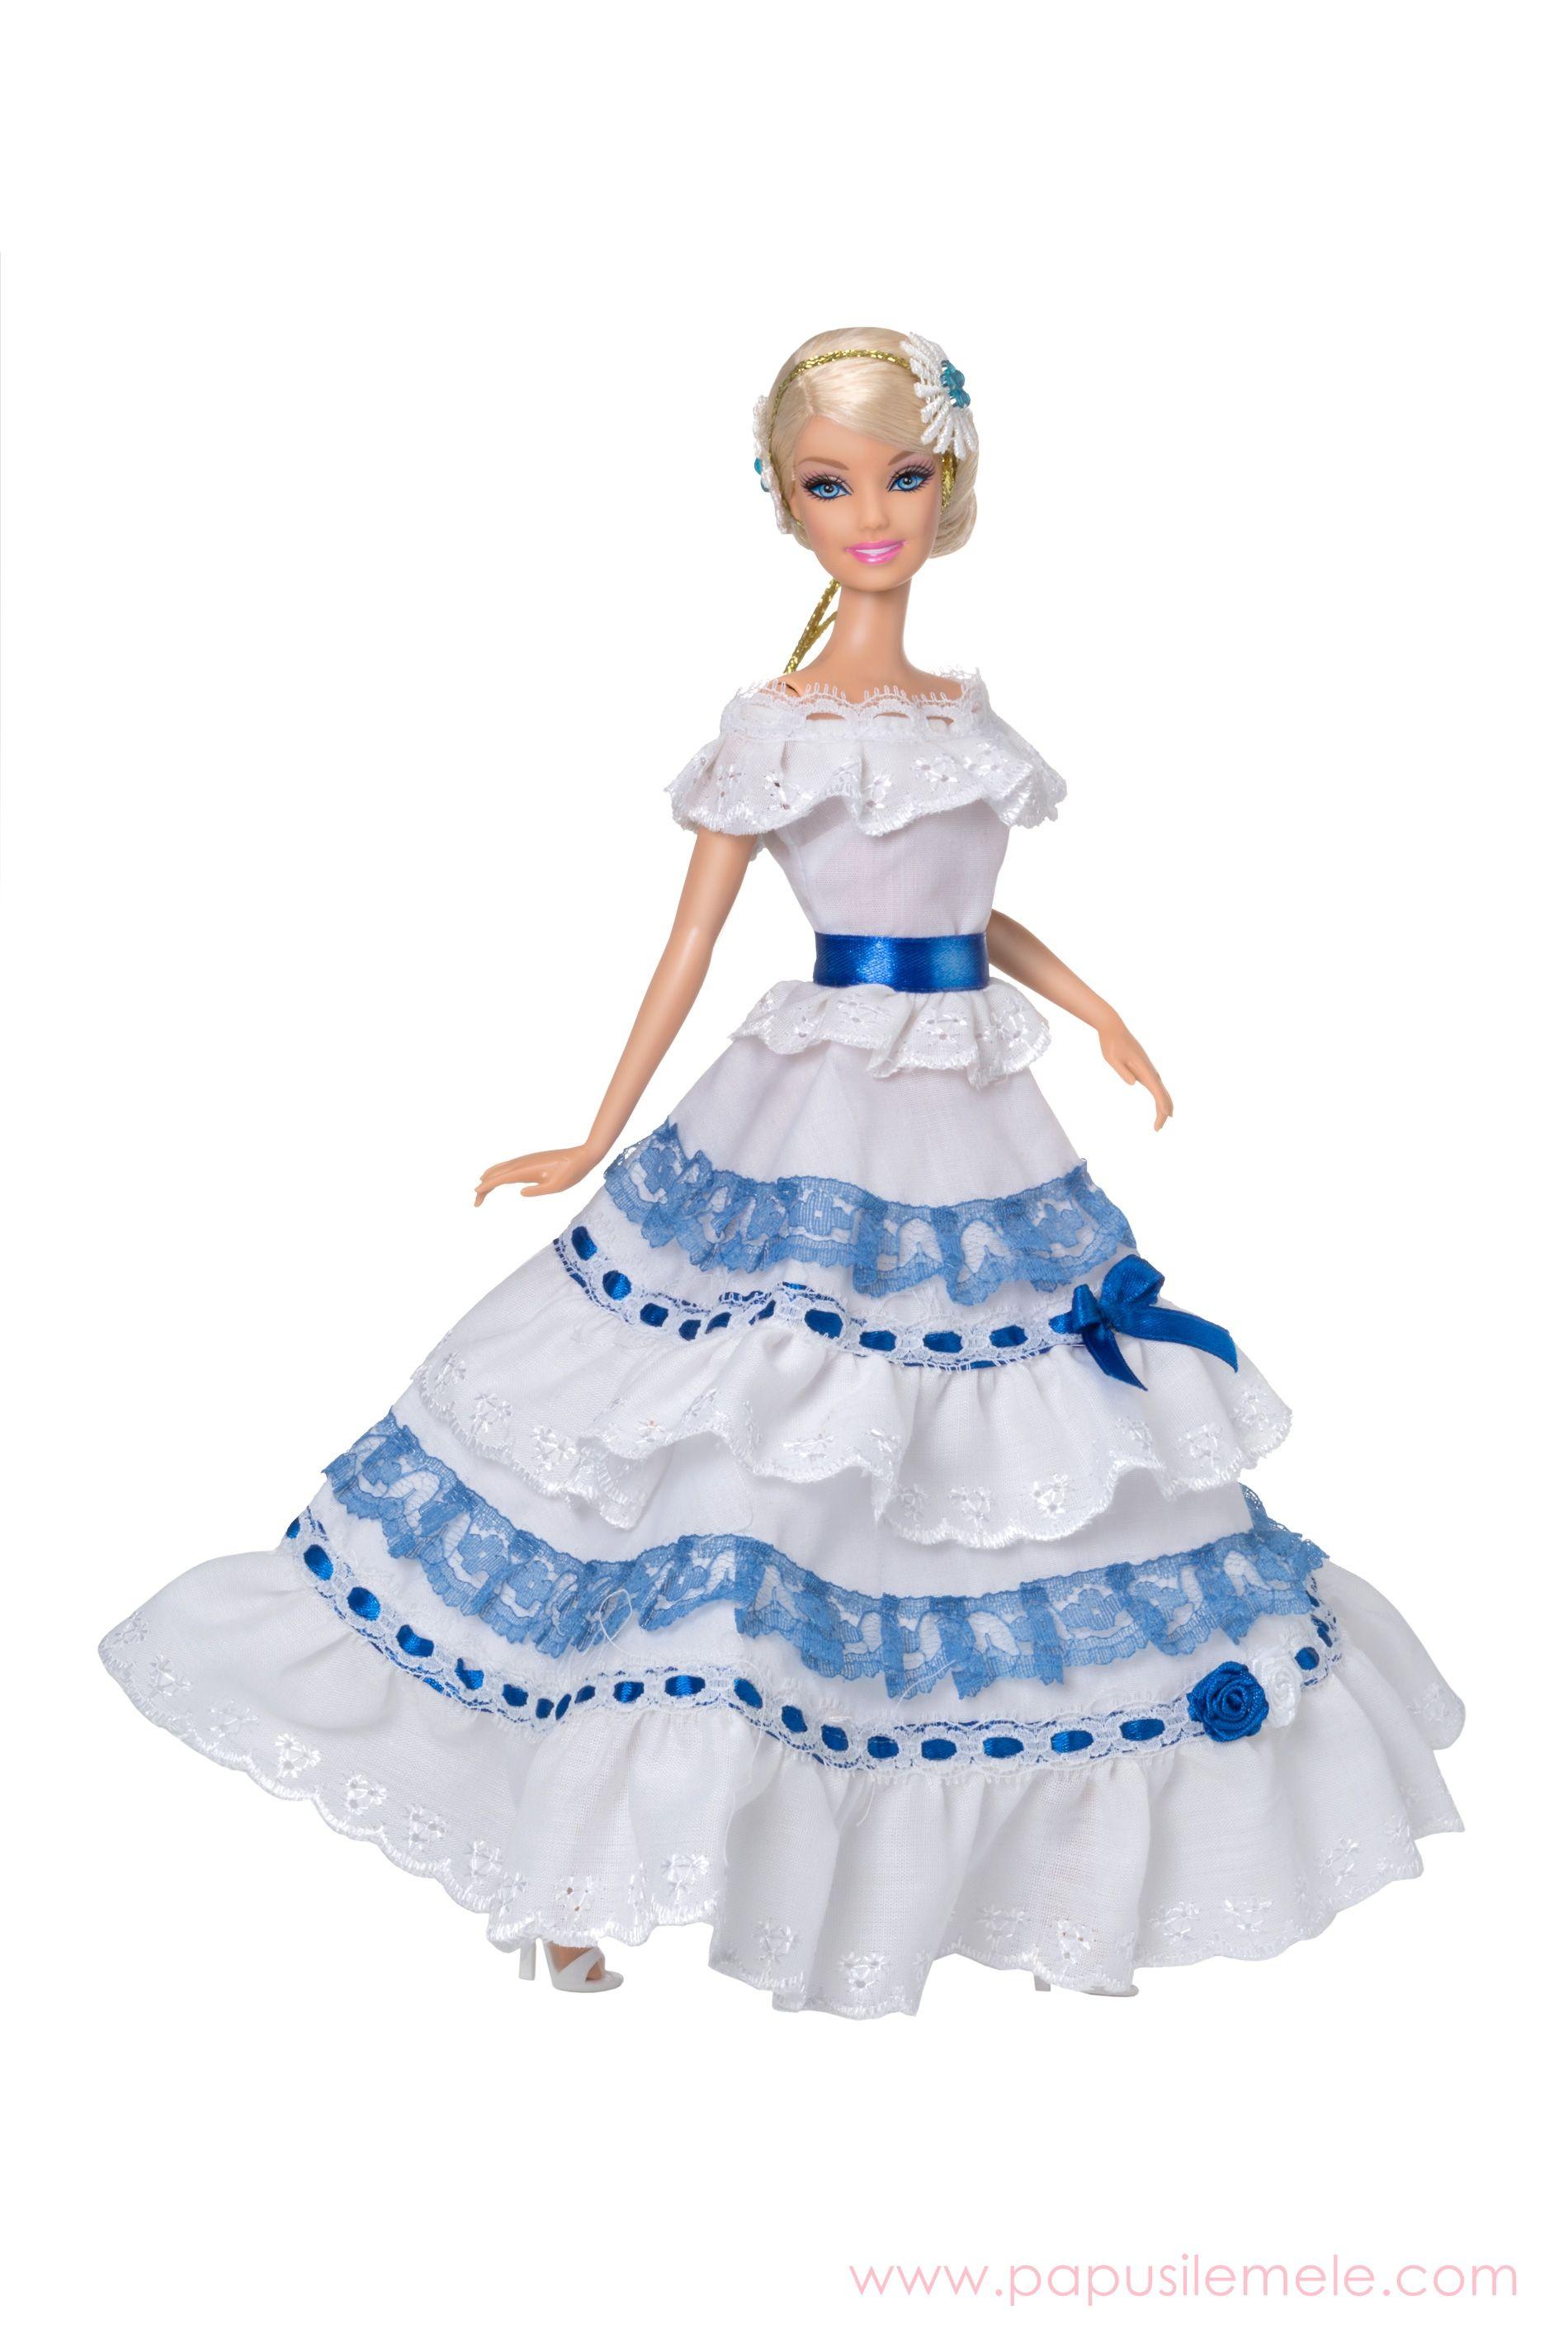 Barbie - Wikipedia 60